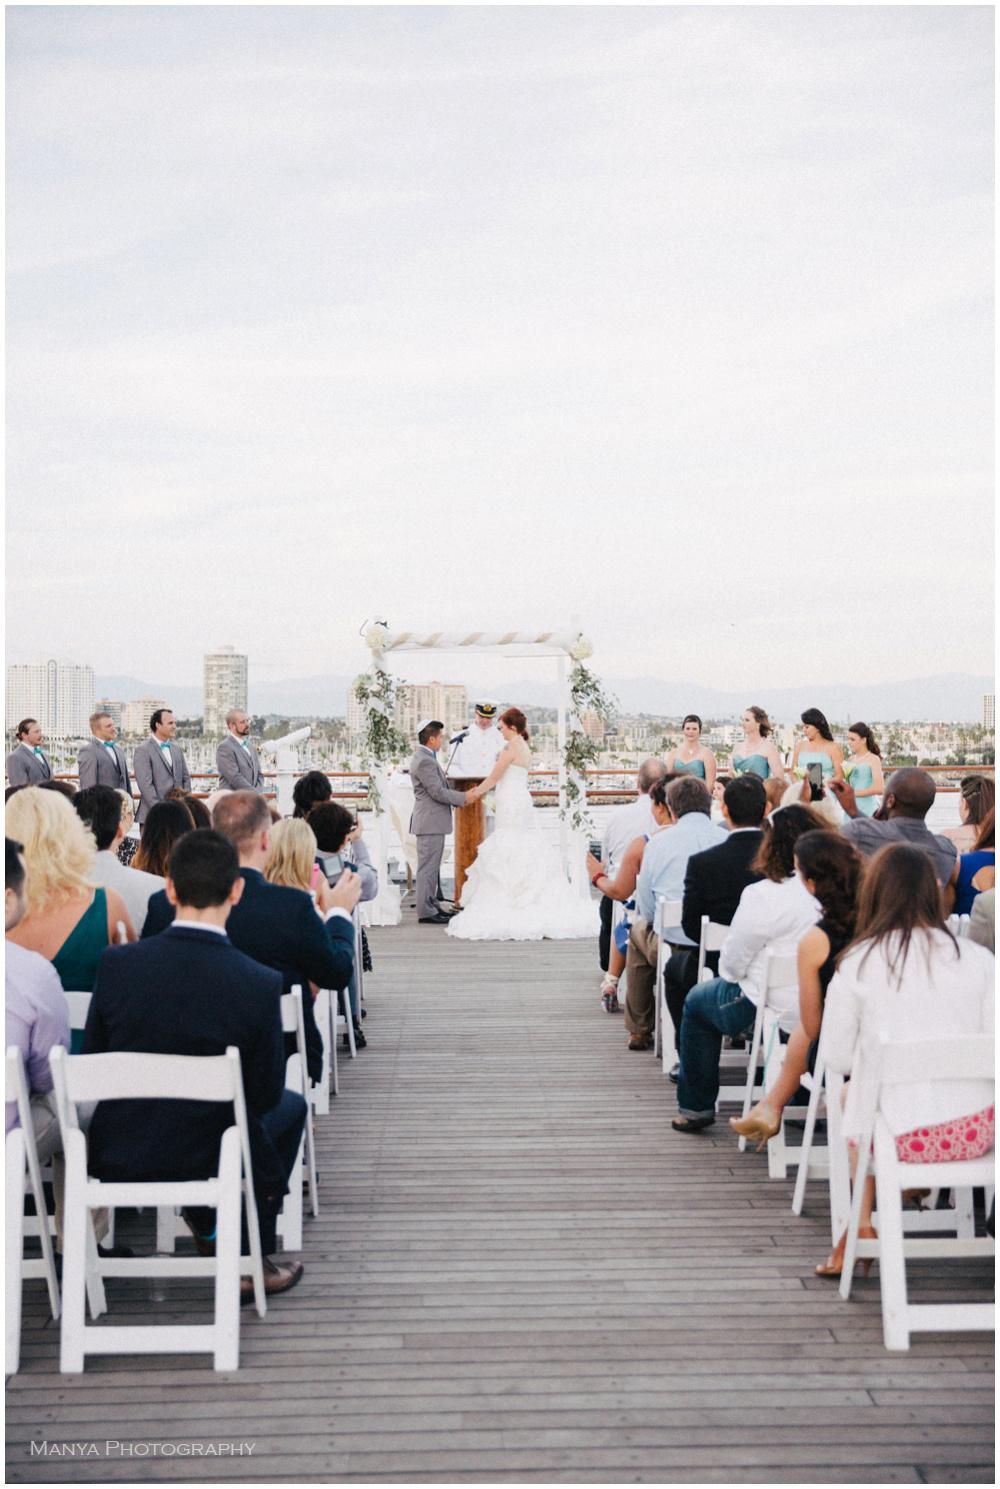 Isaiah and Kate | Wedding | Queen Mary | Long Beach Wedding Photographer | Manya Photography__0022